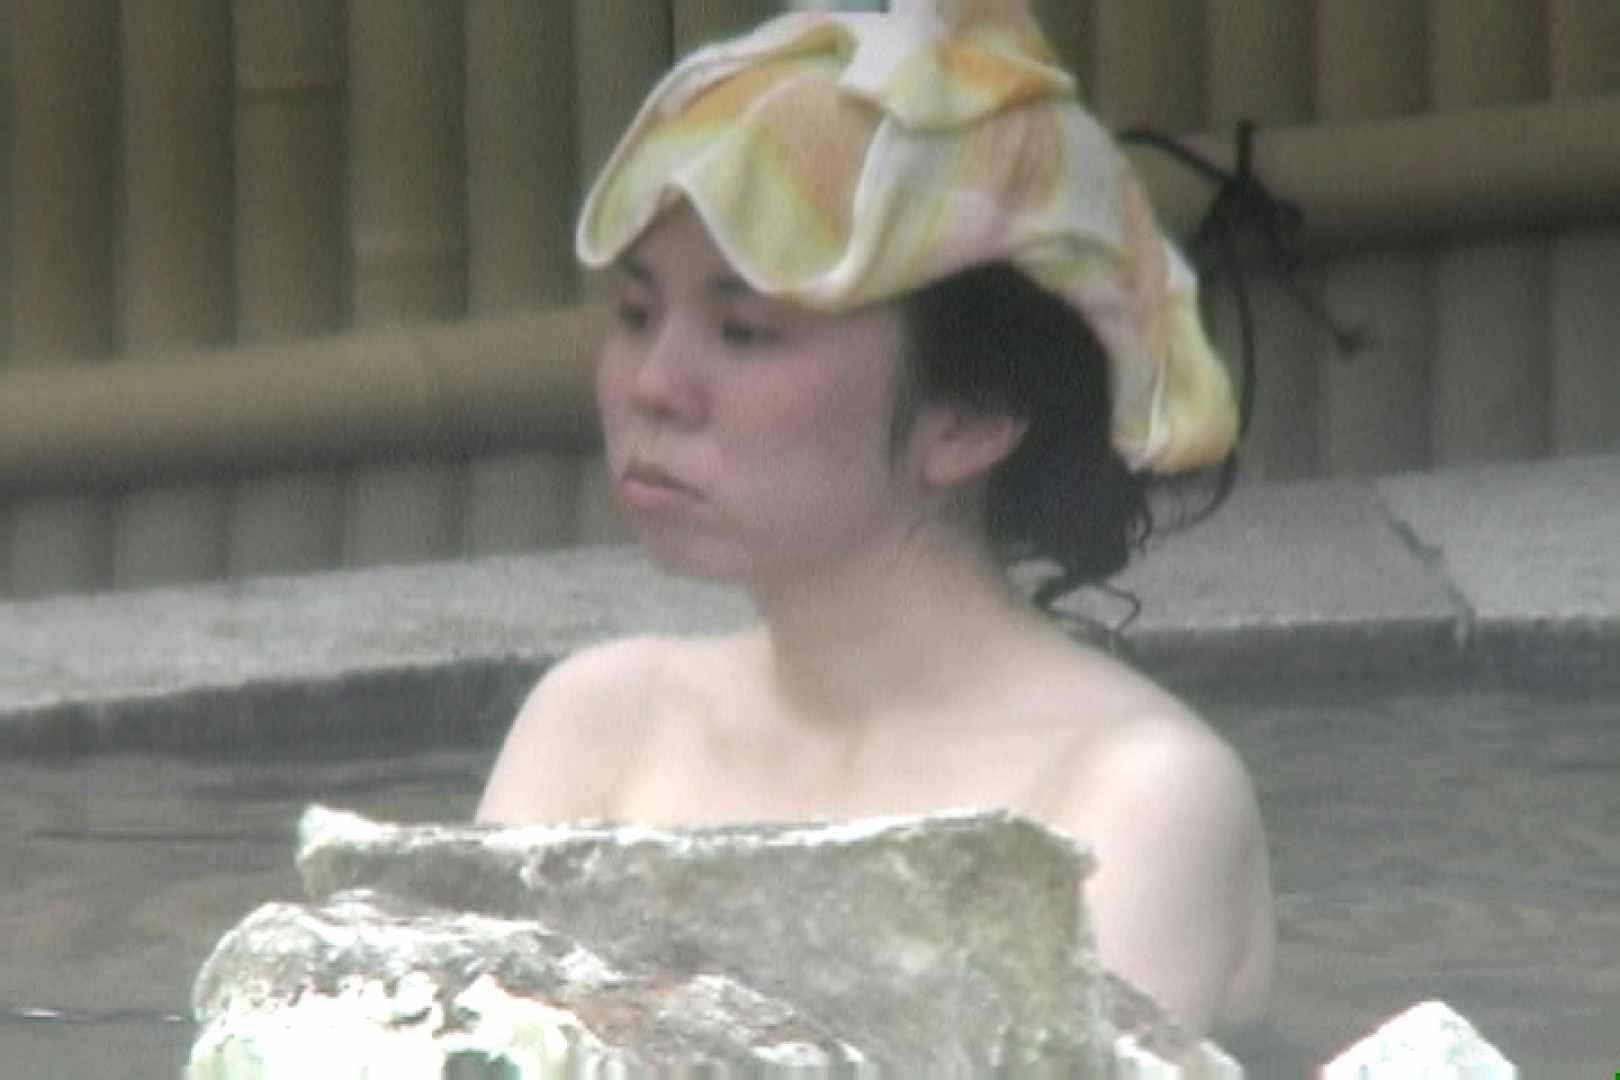 Aquaな露天風呂Vol.687 露天 隠し撮りオマンコ動画紹介 63画像 32